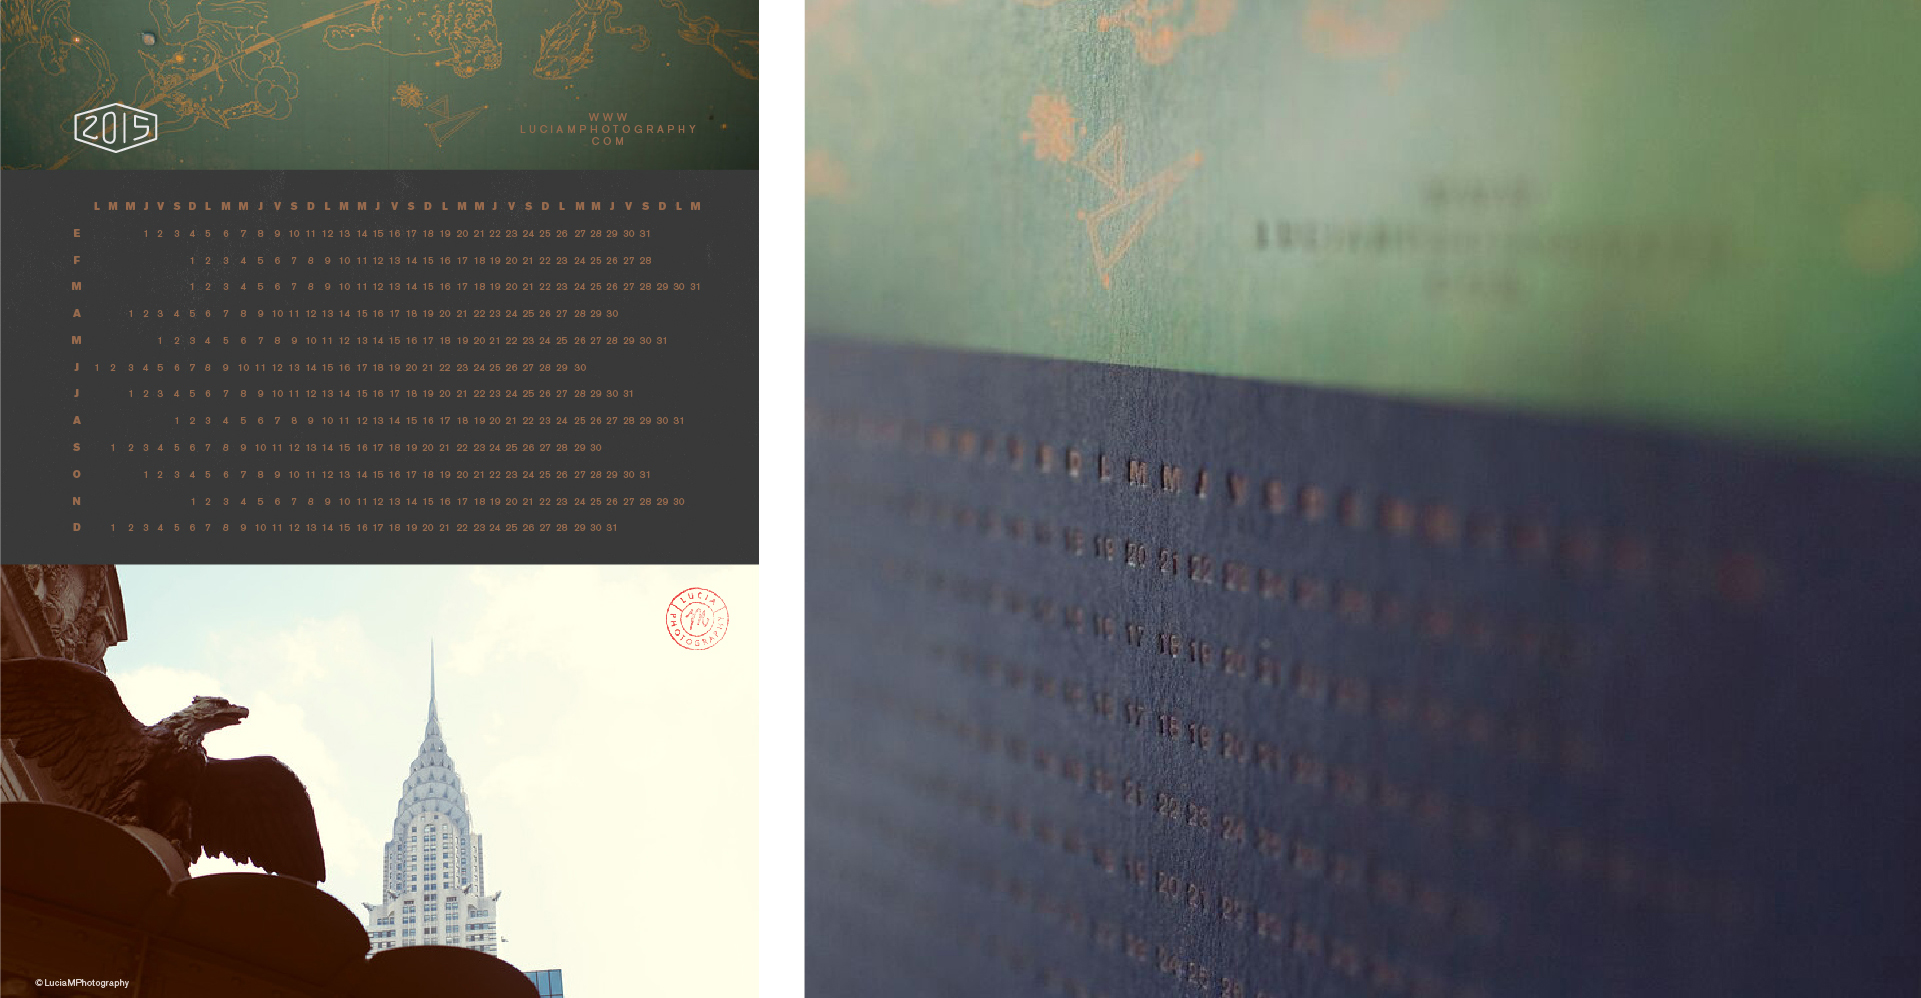 LuciaM_Calendar.jpg